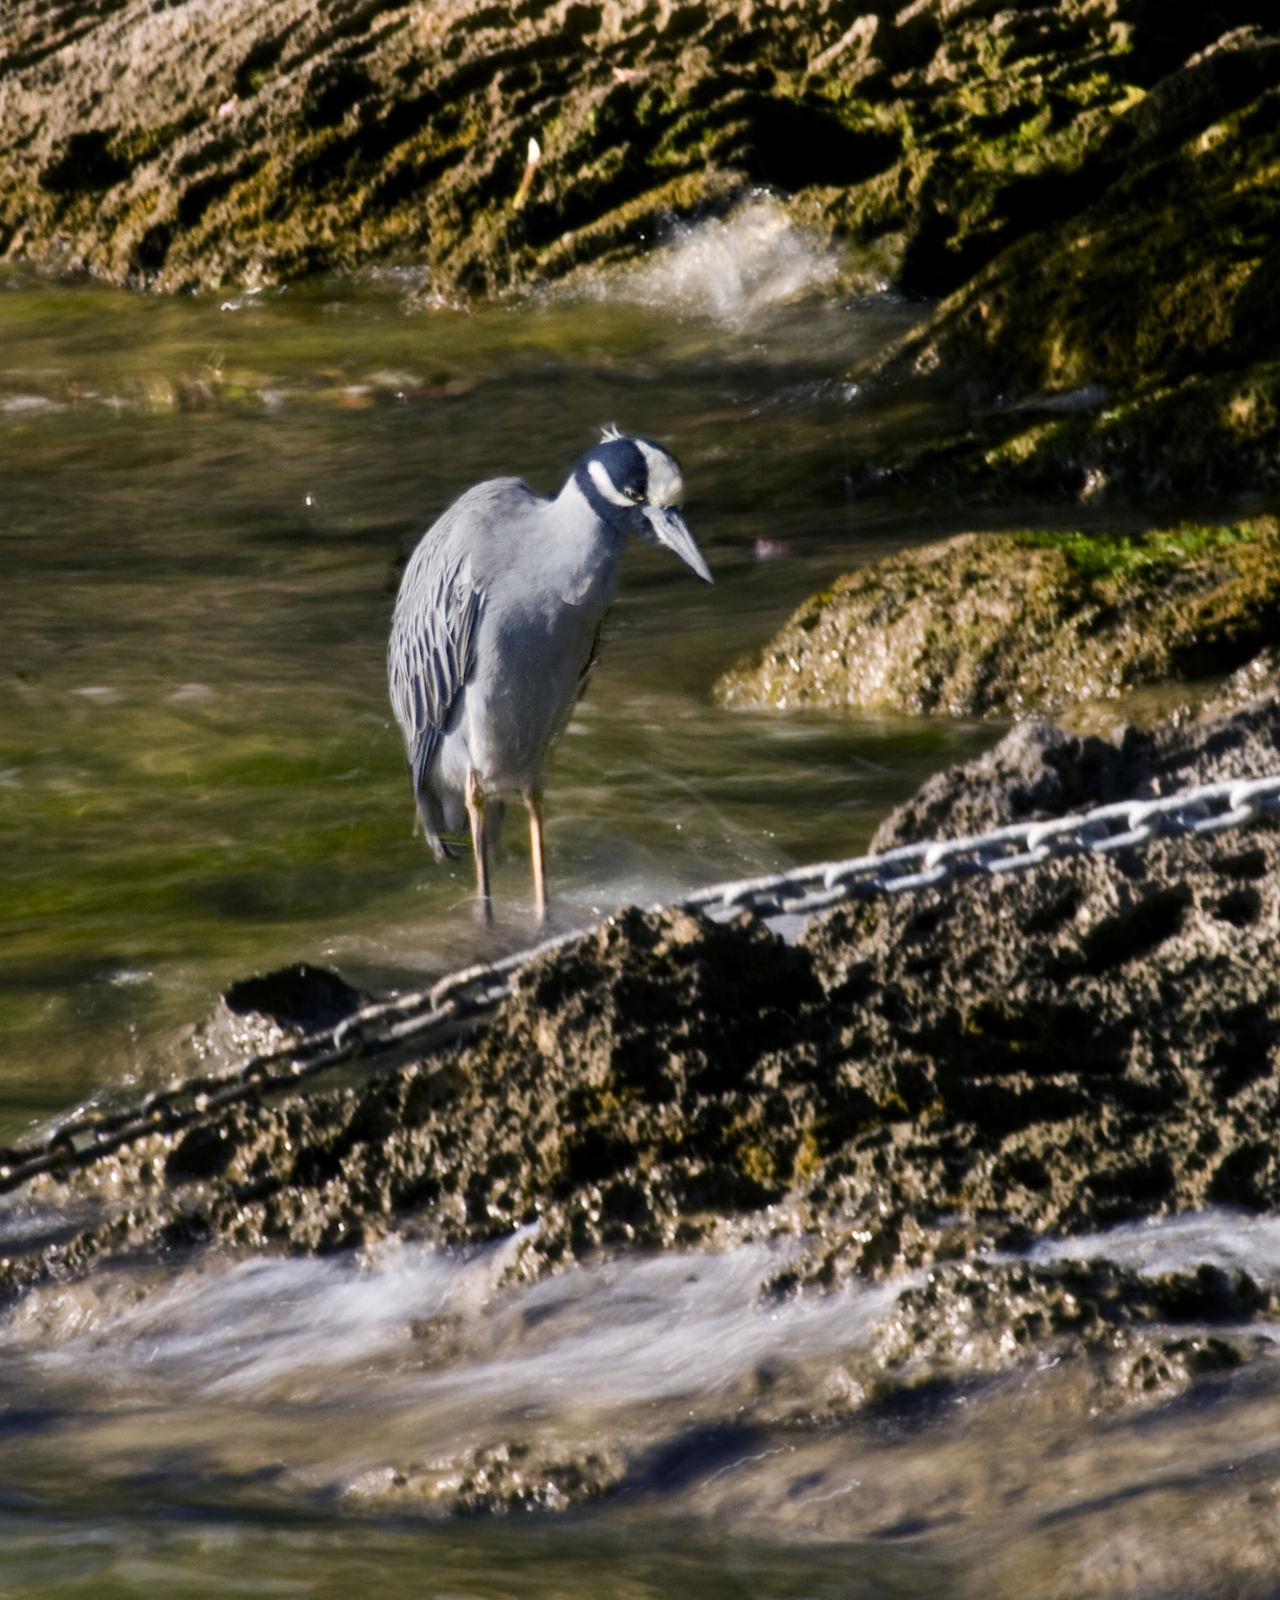 Animal Themes Animal Wildlife Animals In The Wild Bird Blue Heron Chain Day Heron Nature No People One Animal Outdoors Rocks Water